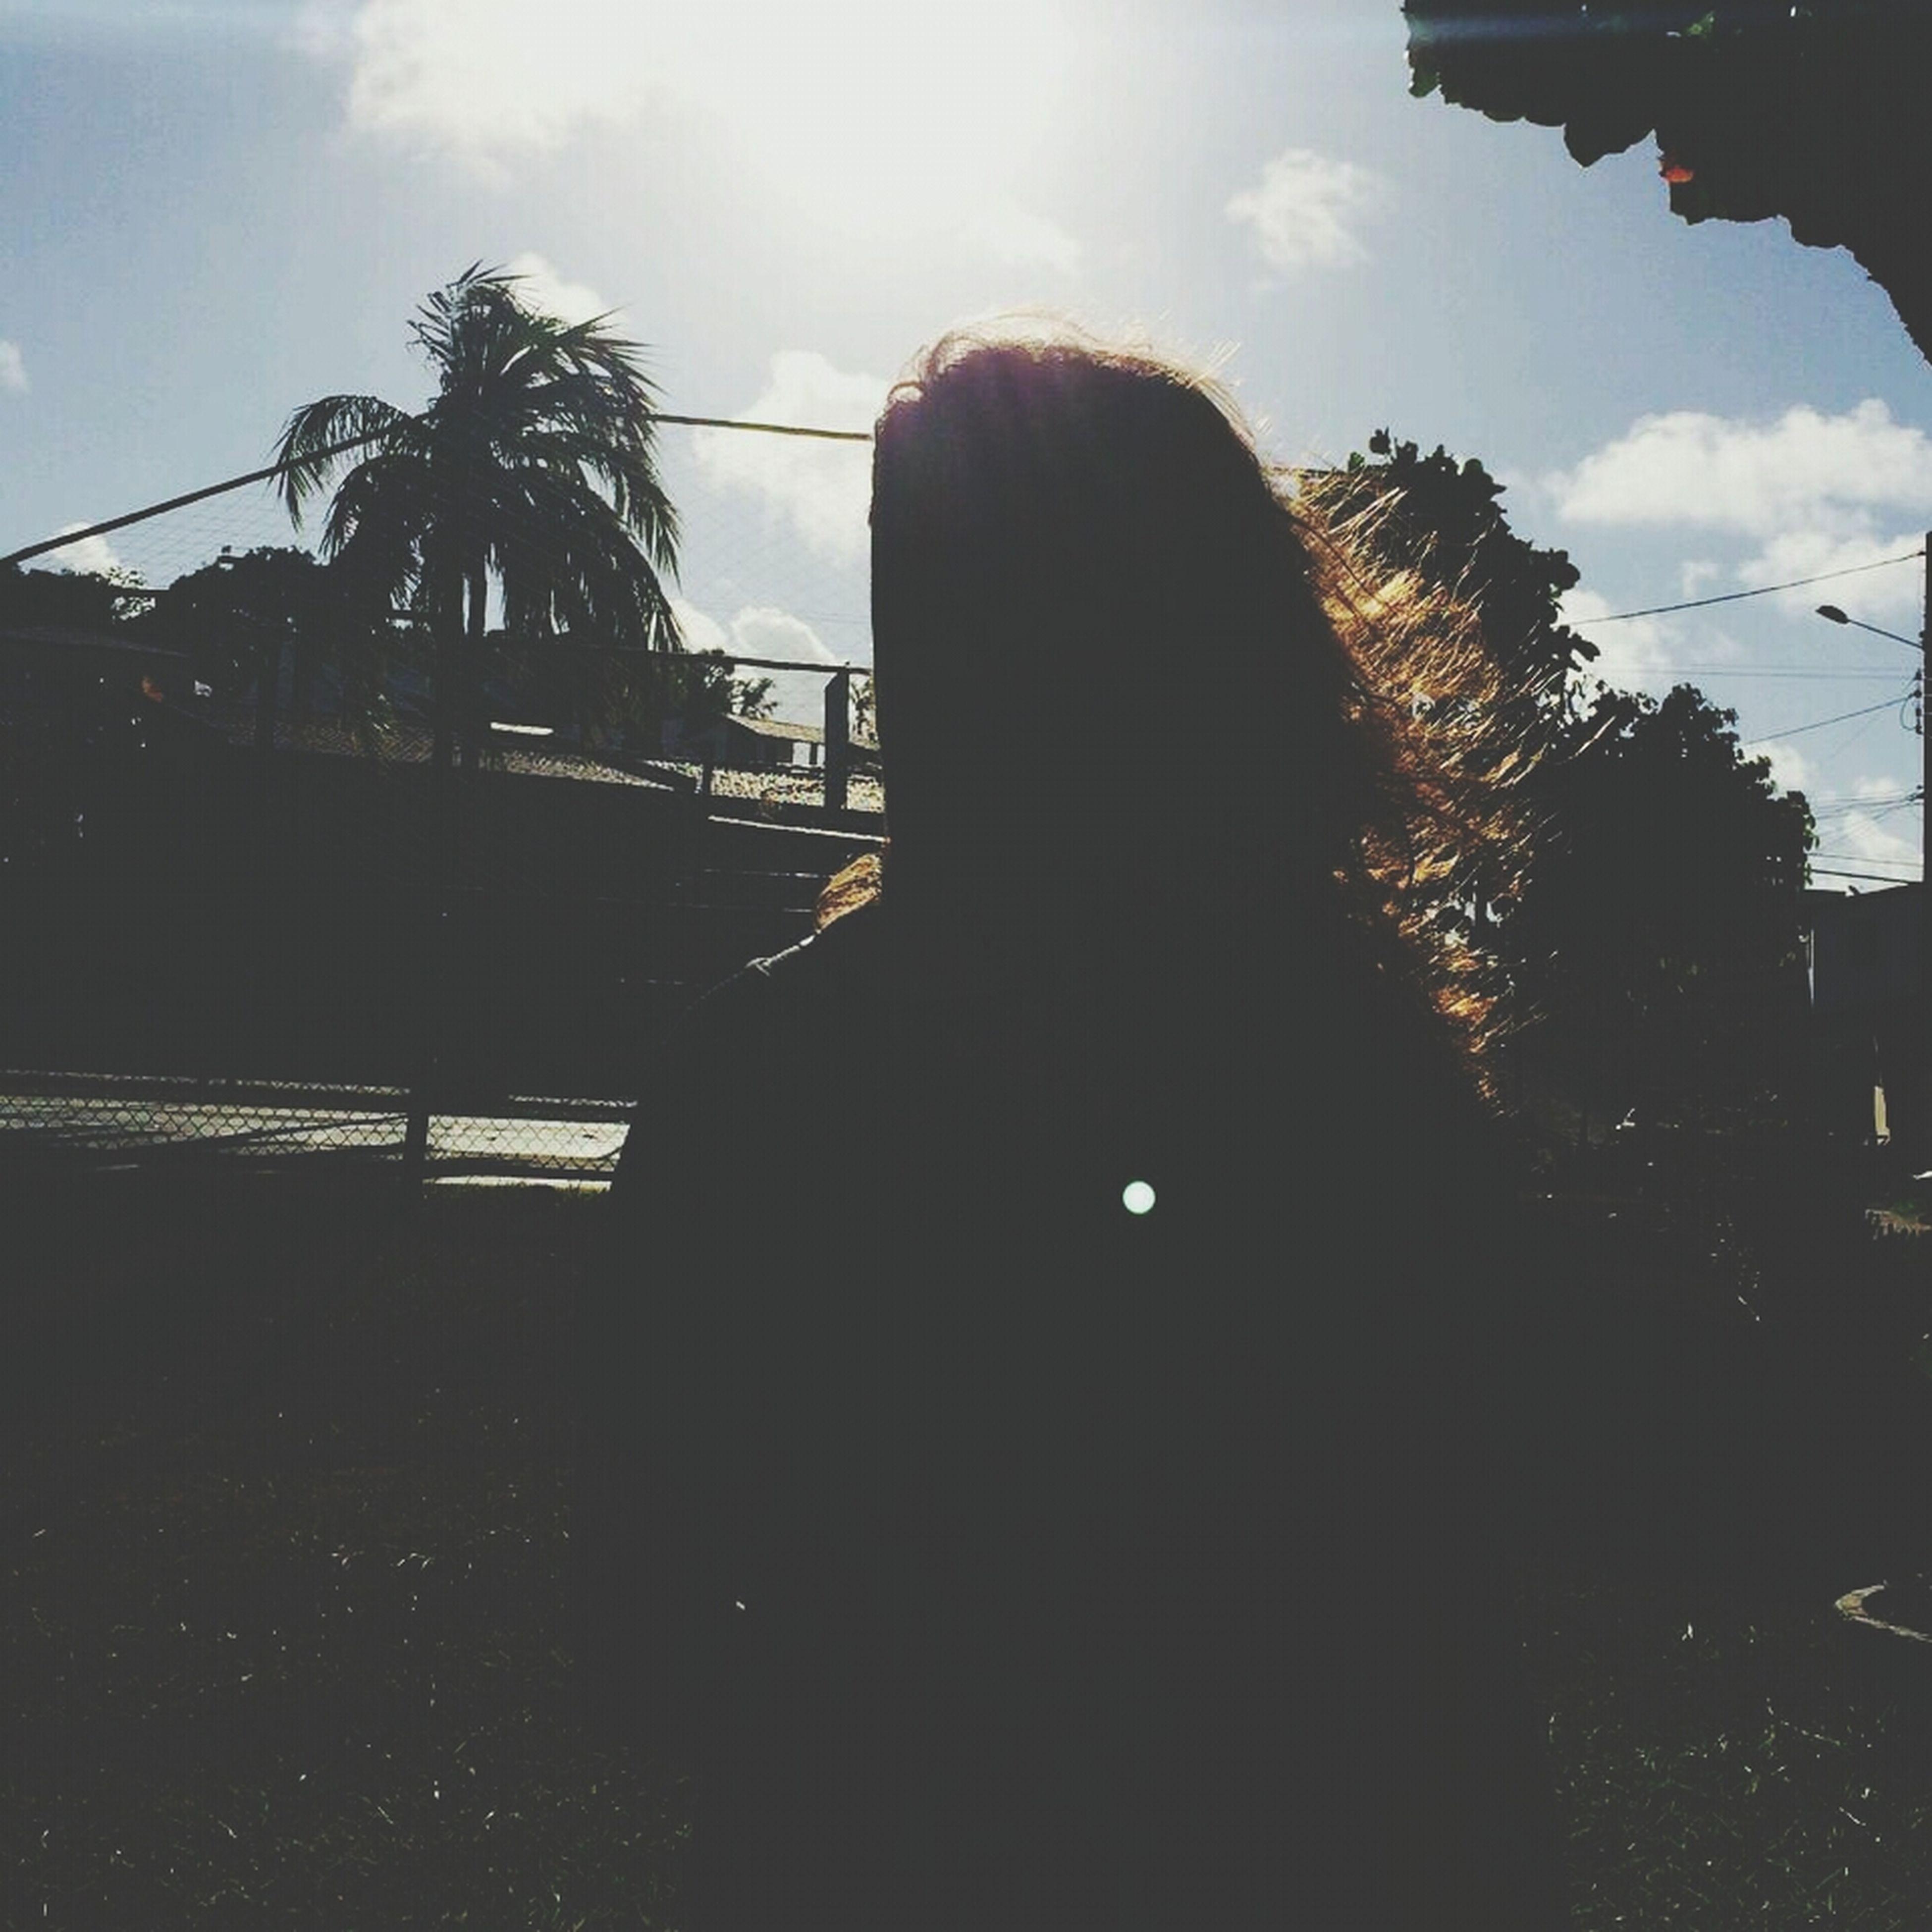 building exterior, sky, built structure, architecture, tree, silhouette, low angle view, sunlight, cloud - sky, sunset, house, cloud, building, outdoors, city, no people, sunbeam, street light, street, sun